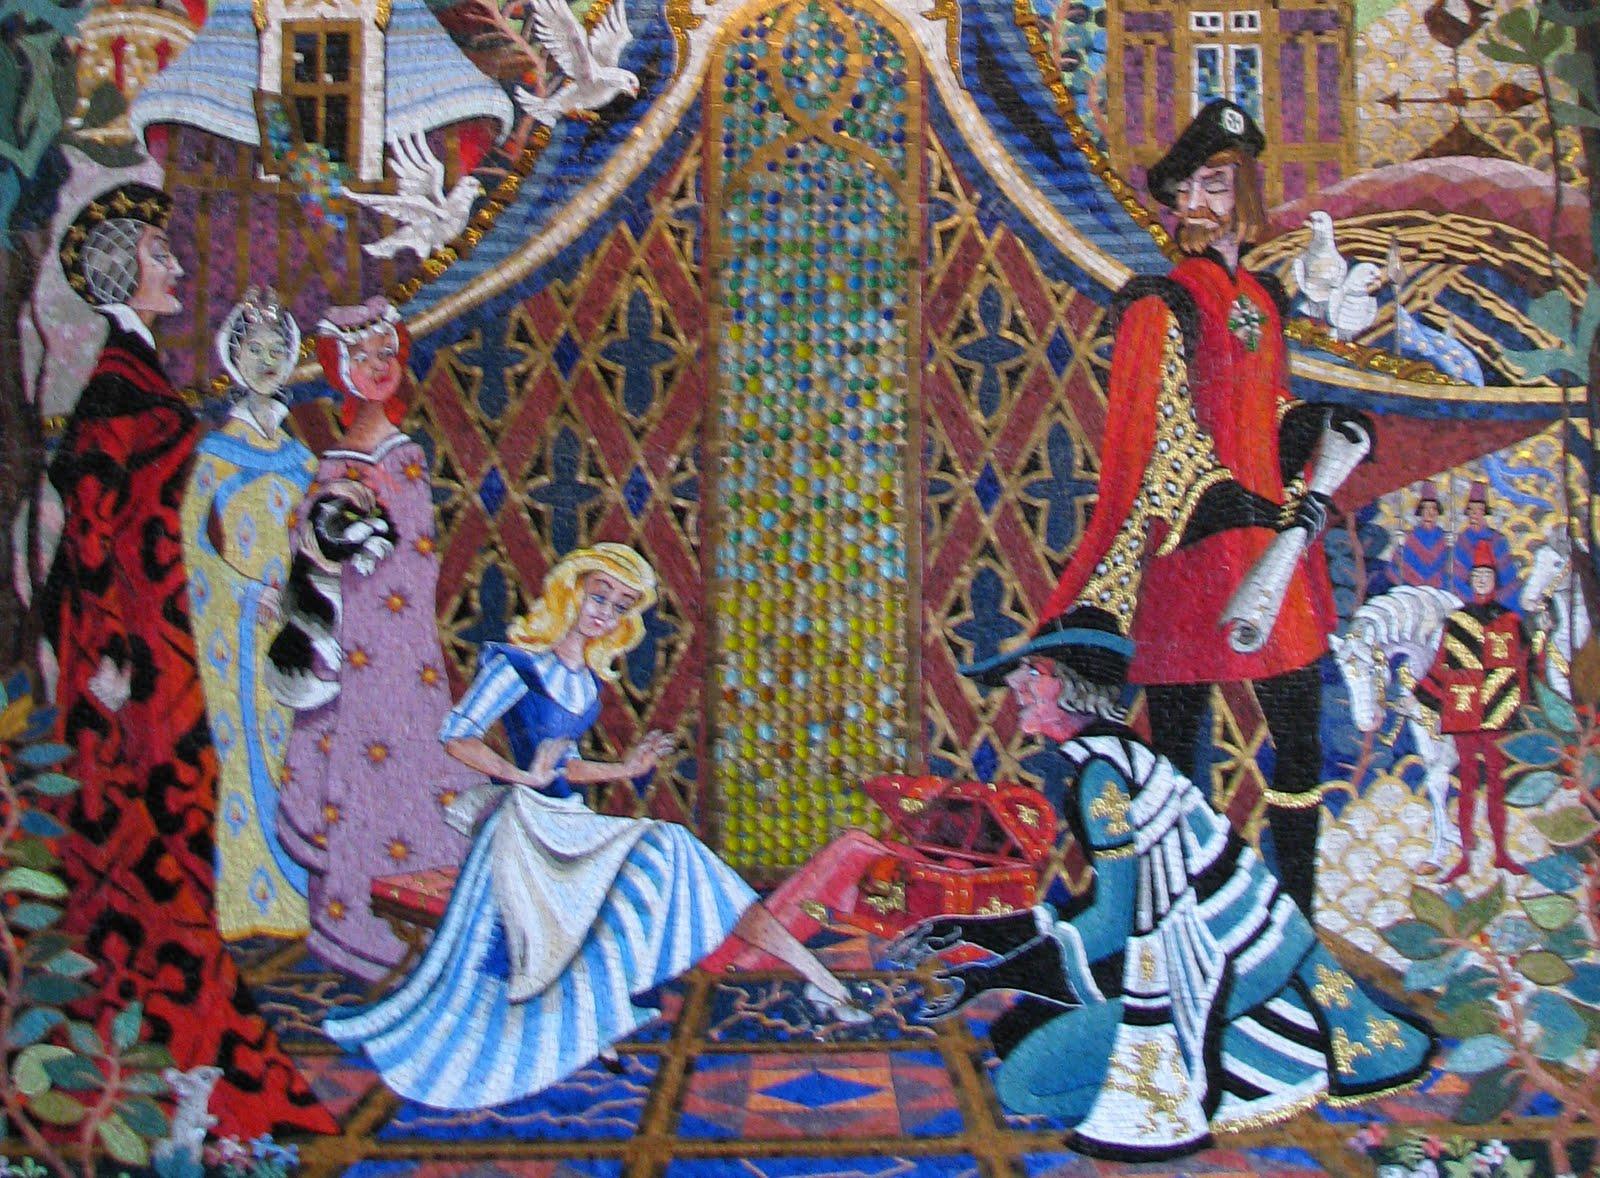 cinderella castle mosaics in the magic kingdom | disney world blog